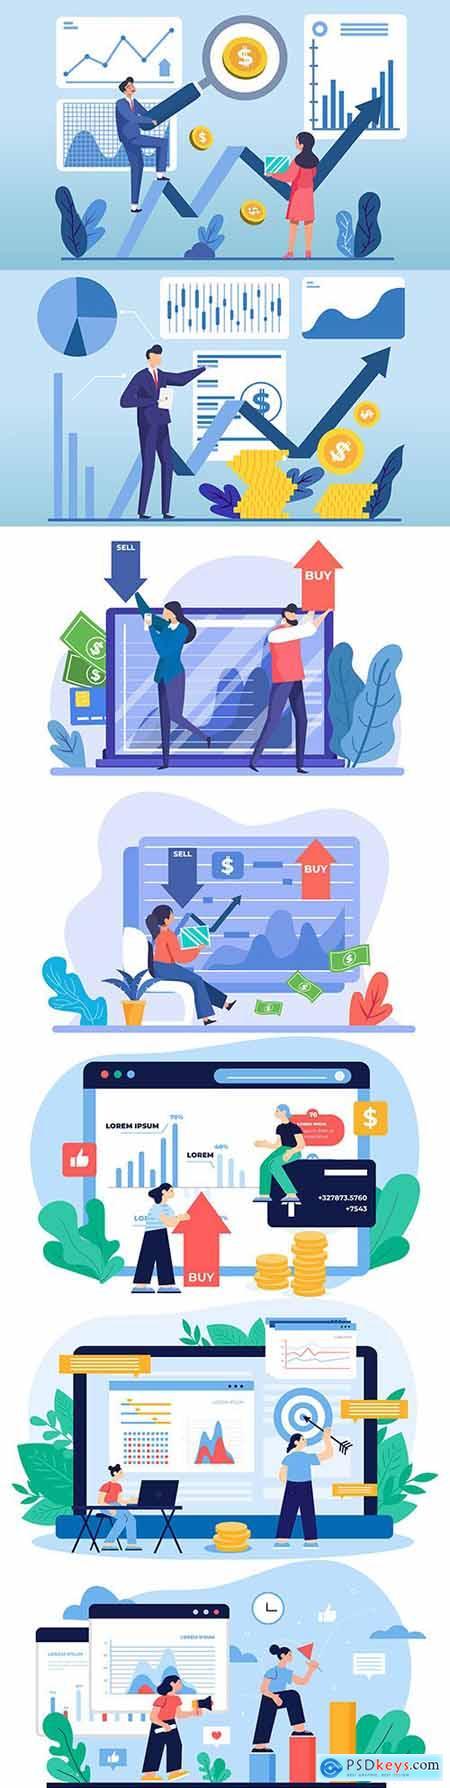 Business success finance and money deposits profitable illustrations